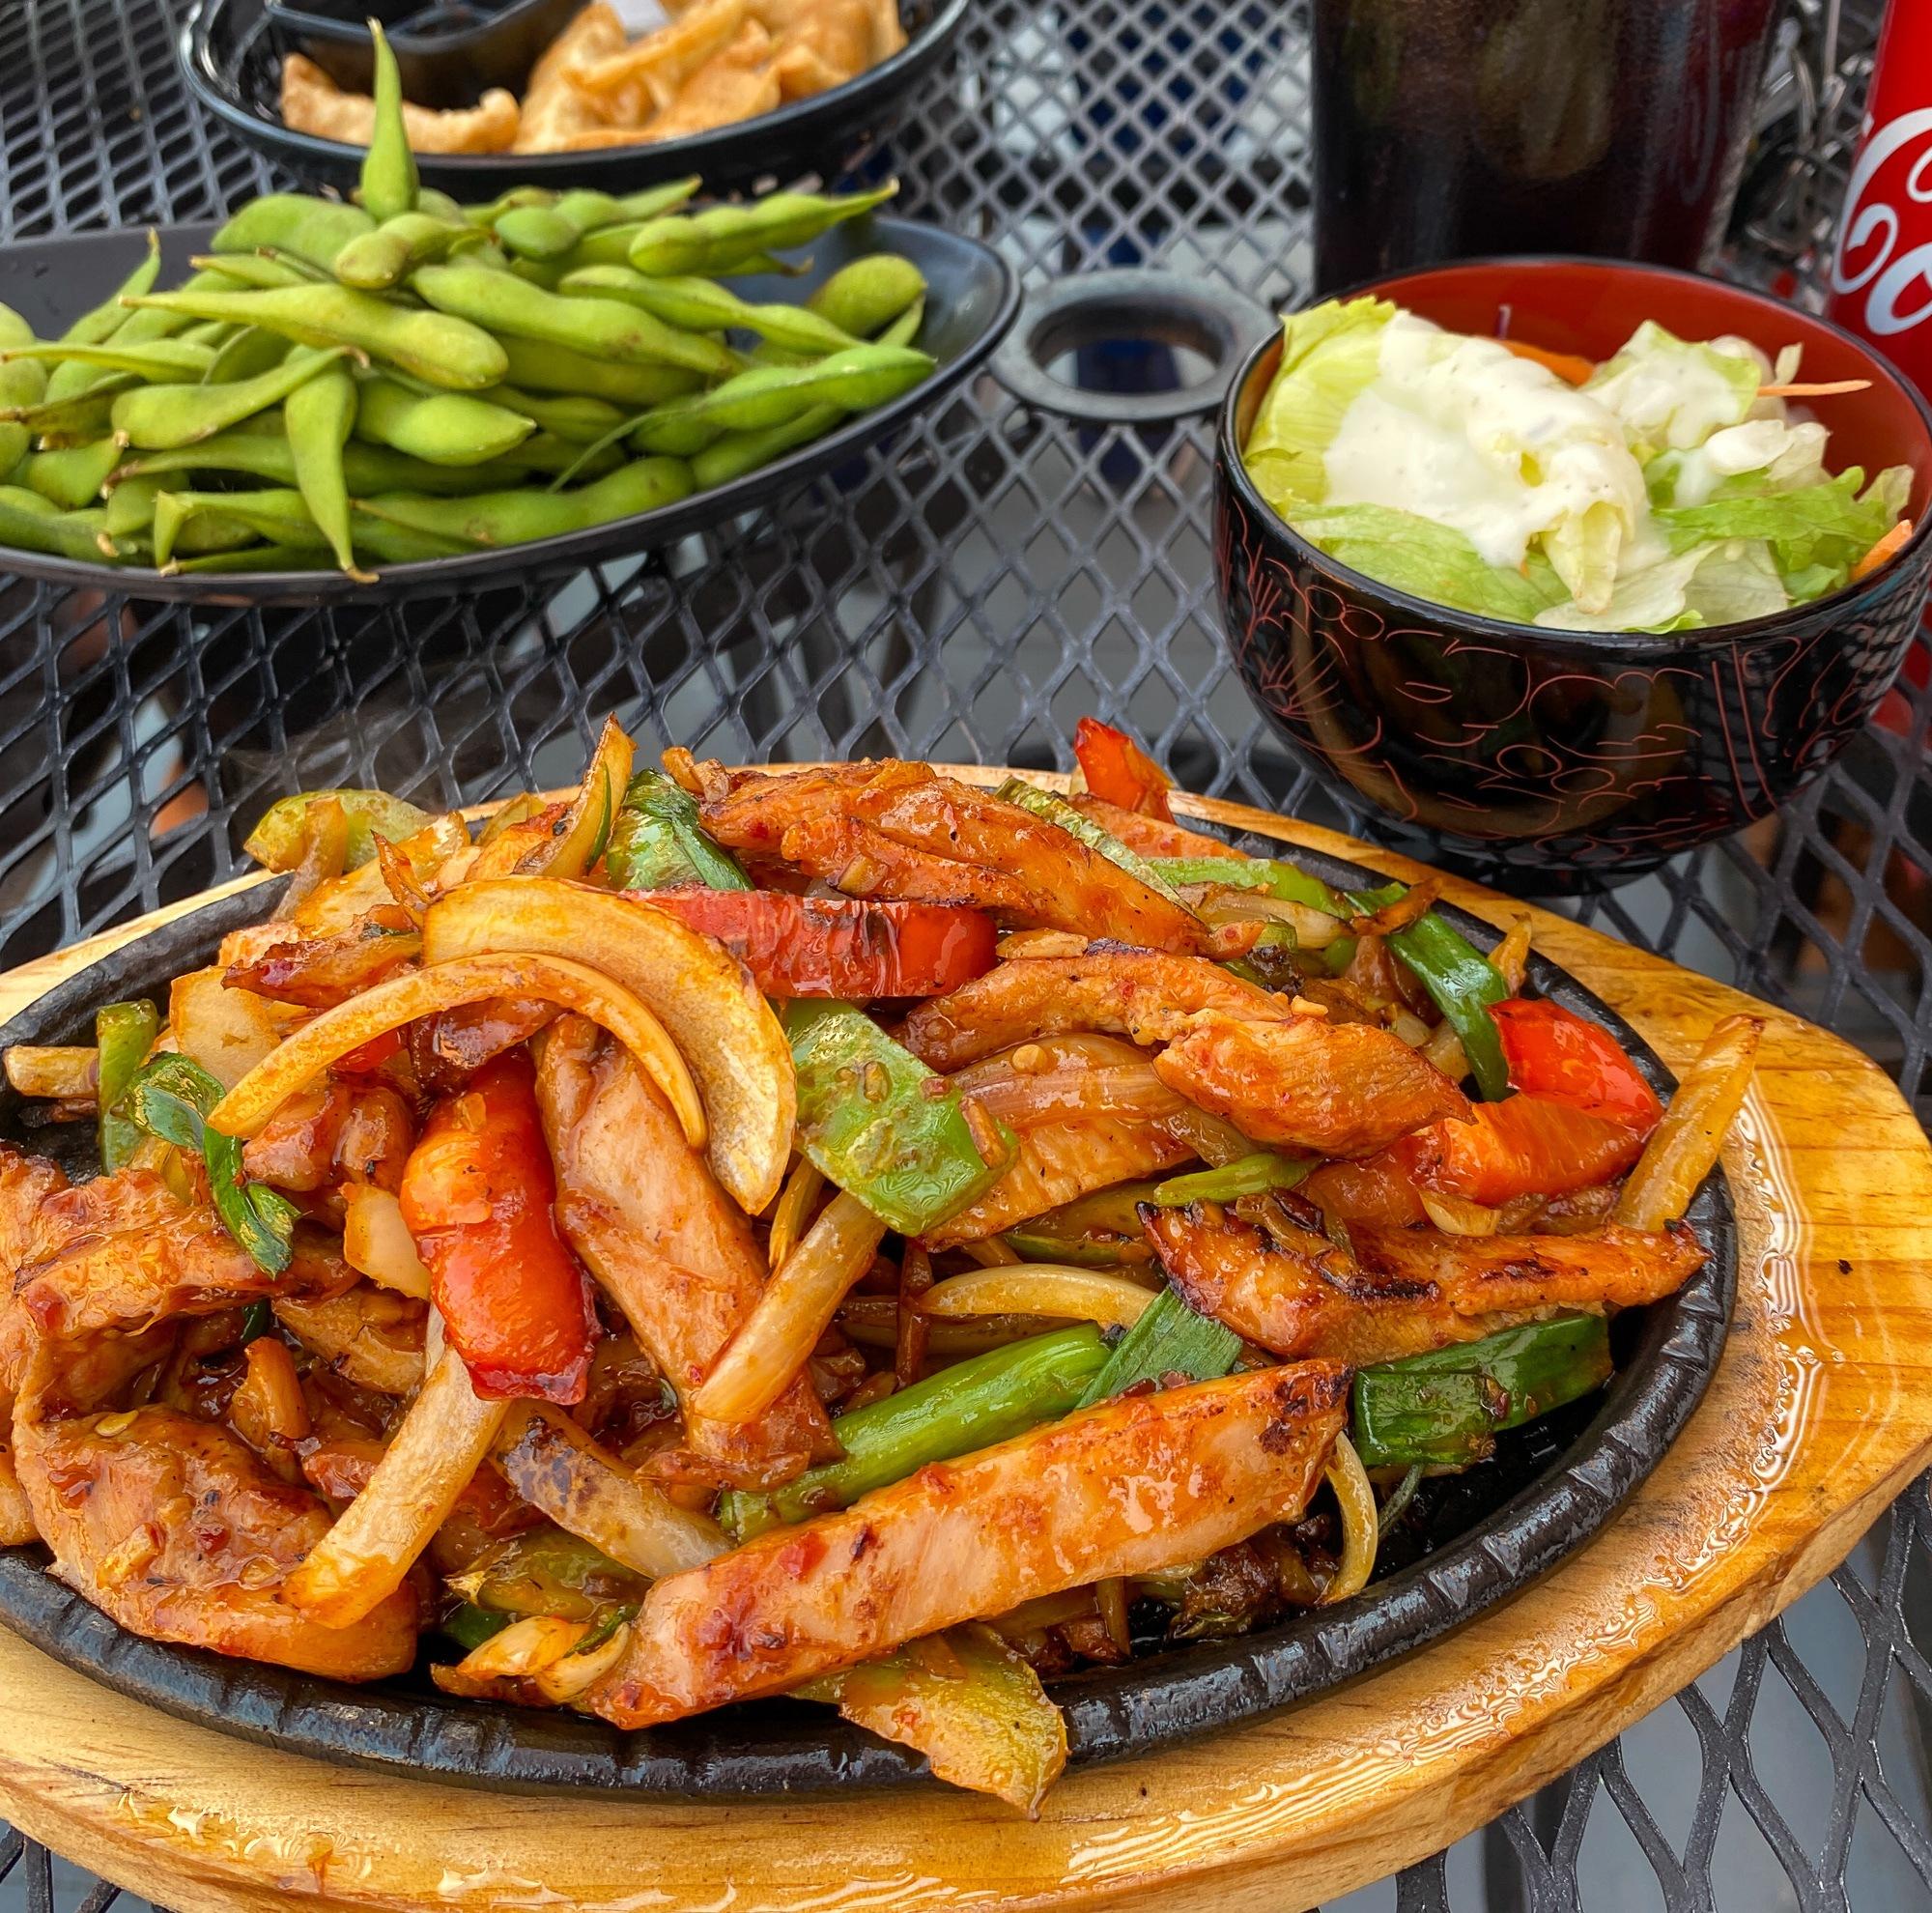 Chicken bul go ghi, edamame, pork gyoza and side salad at New York Teriyaki in Page, AZ